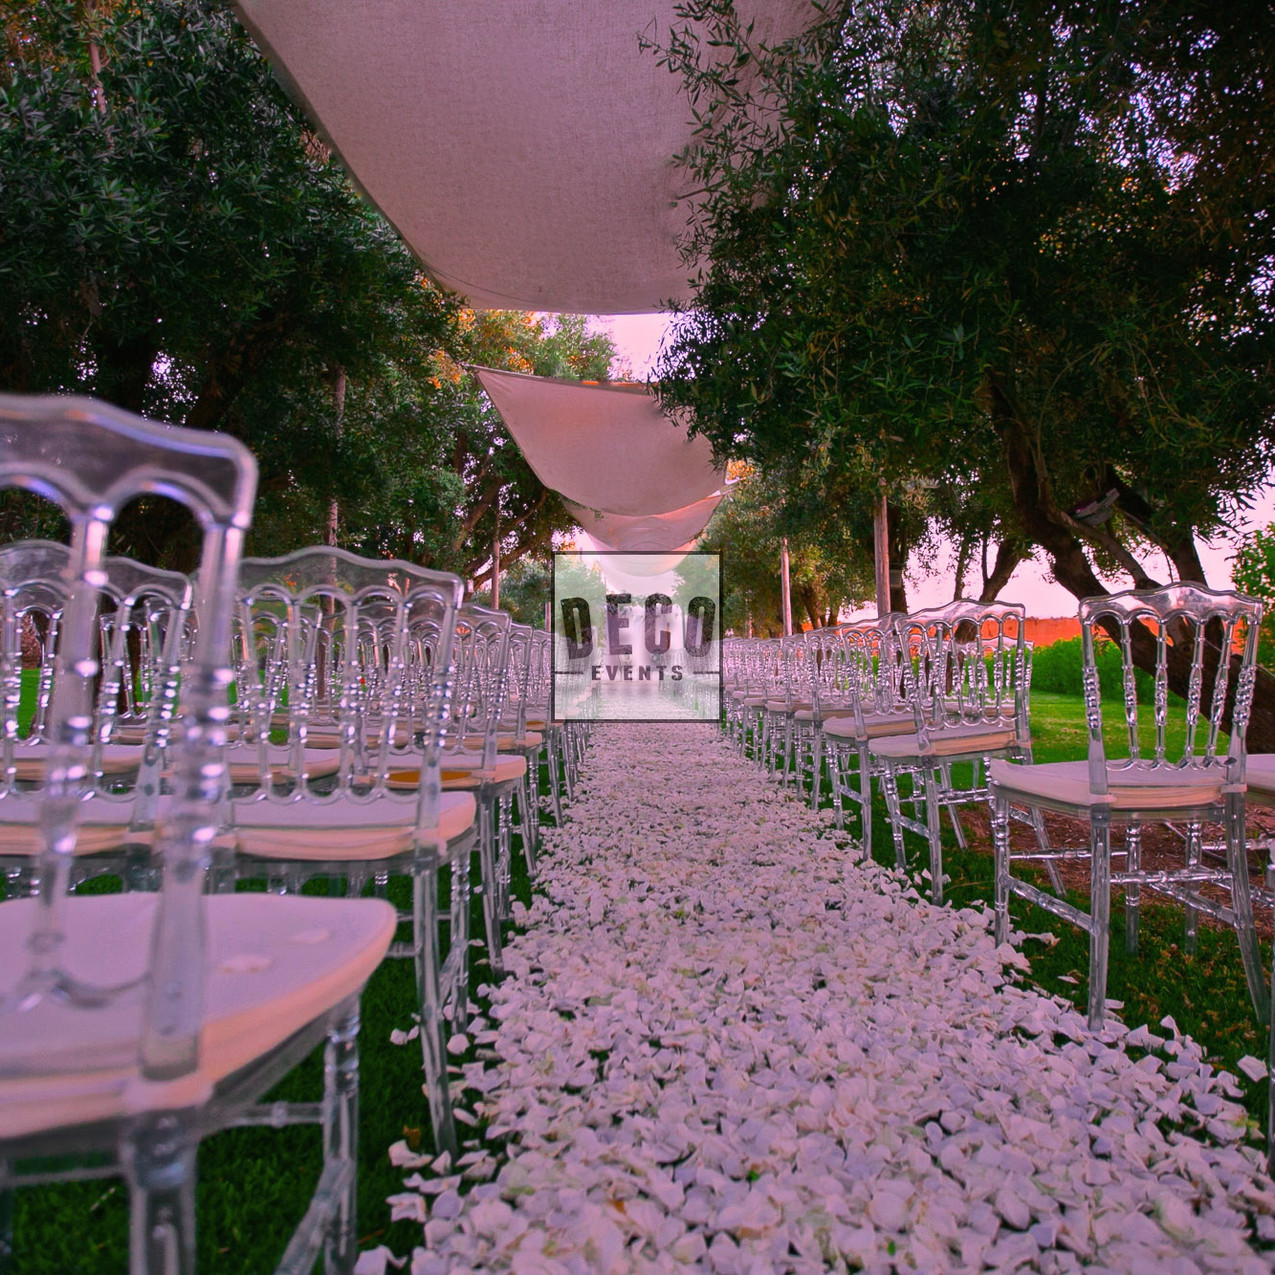 DECO_Events_decoration_ceremonie_religieuse_laique_mariage_region_paca_5